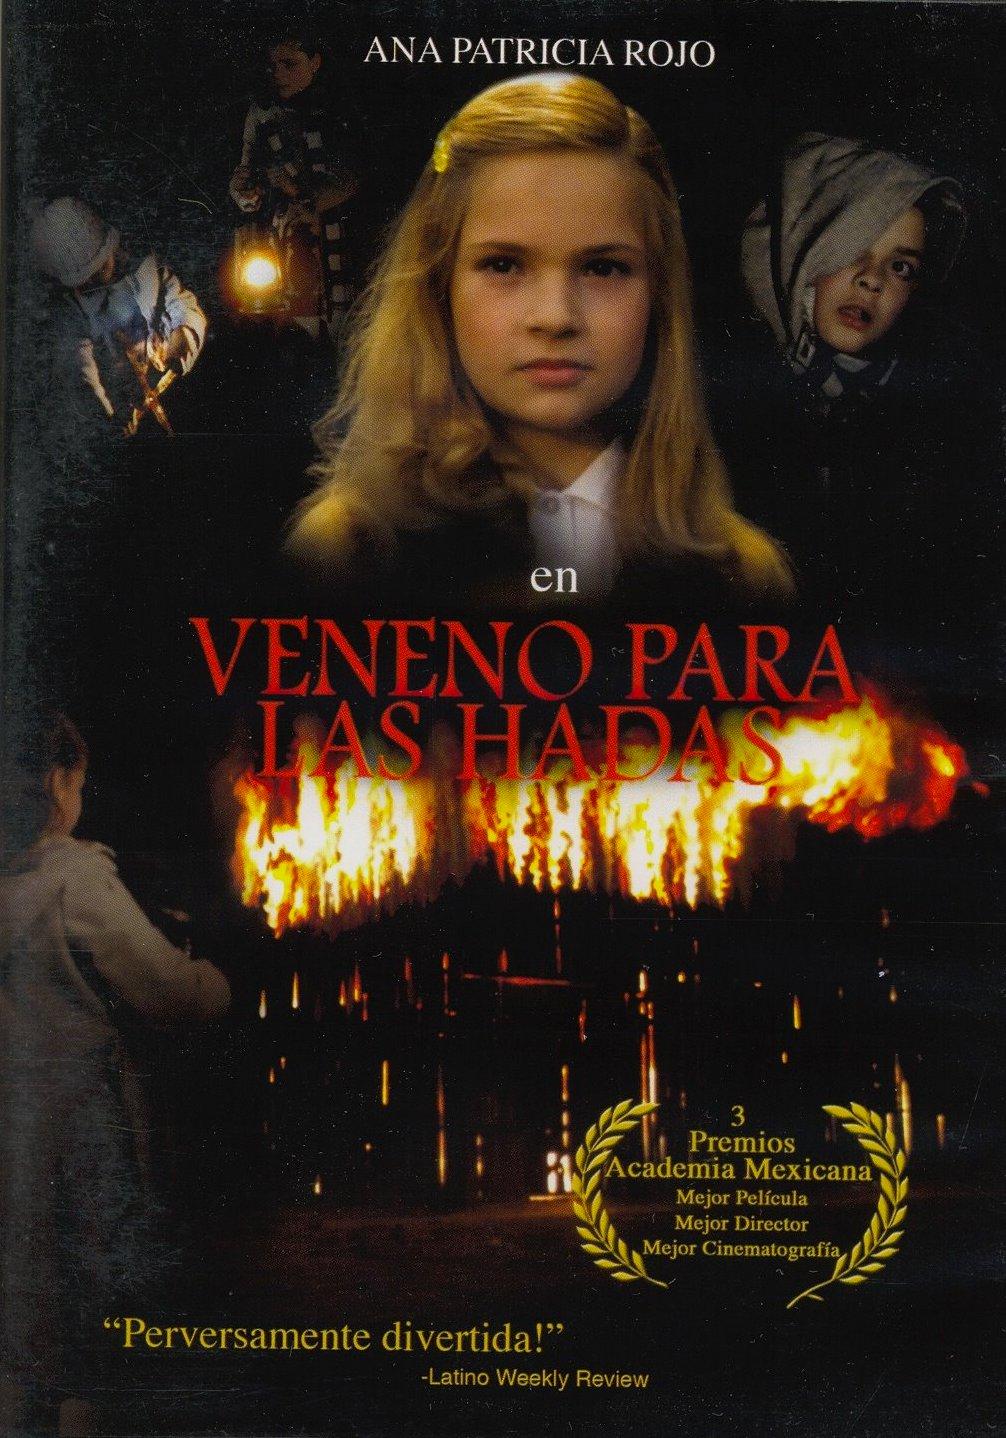 Ana Patricia Rojo ana patricia rojo | kalafudra's stuff